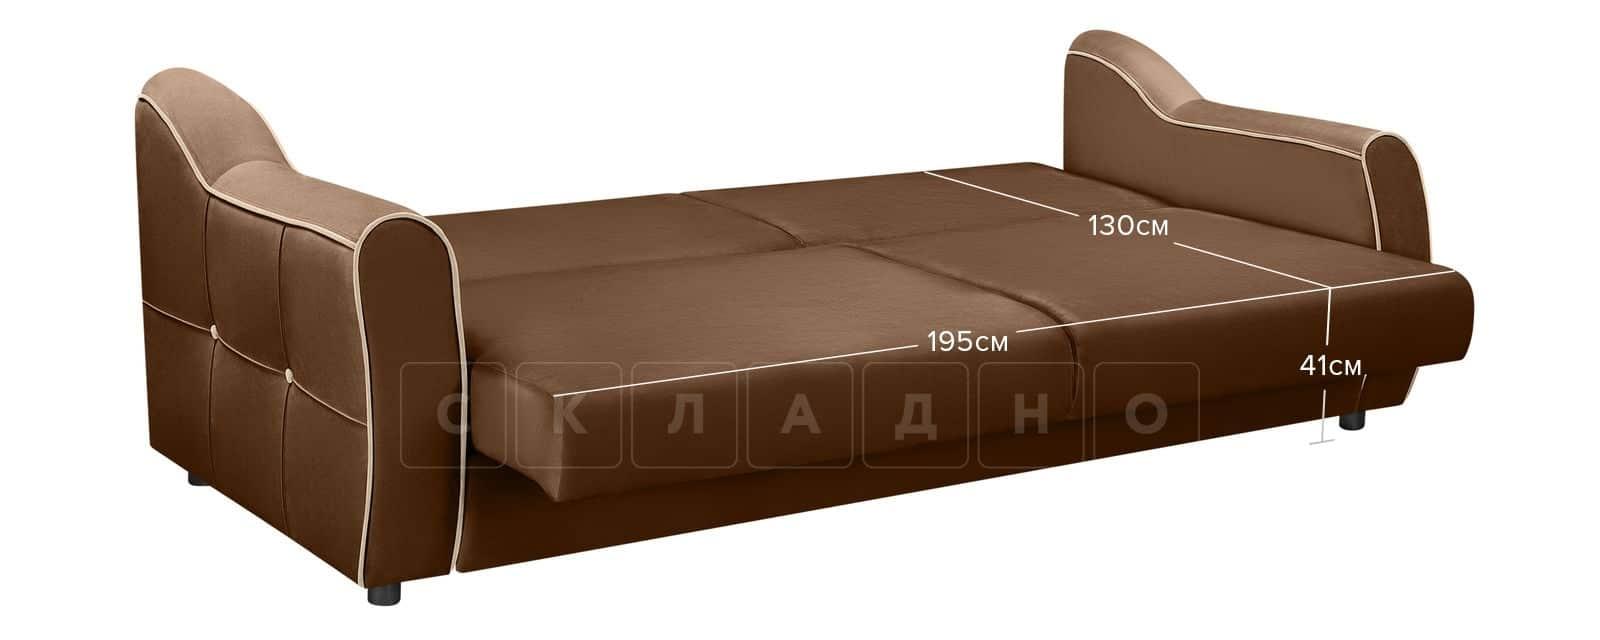 Диван Флэтфорд велюр коричневый фото 11 | интернет-магазин Складно